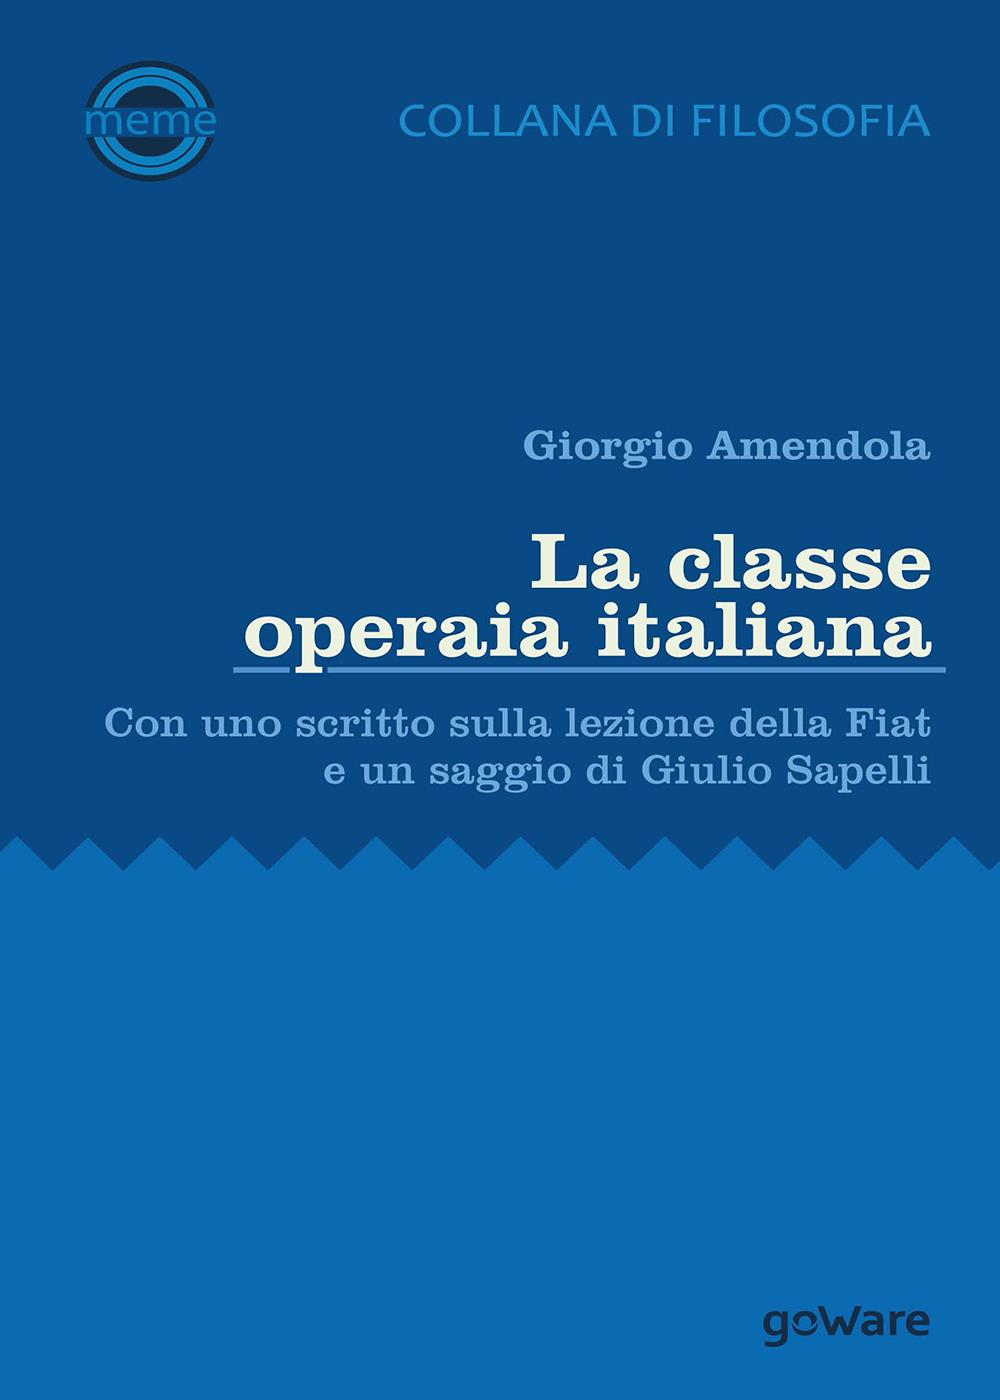 La classe operaia italiana